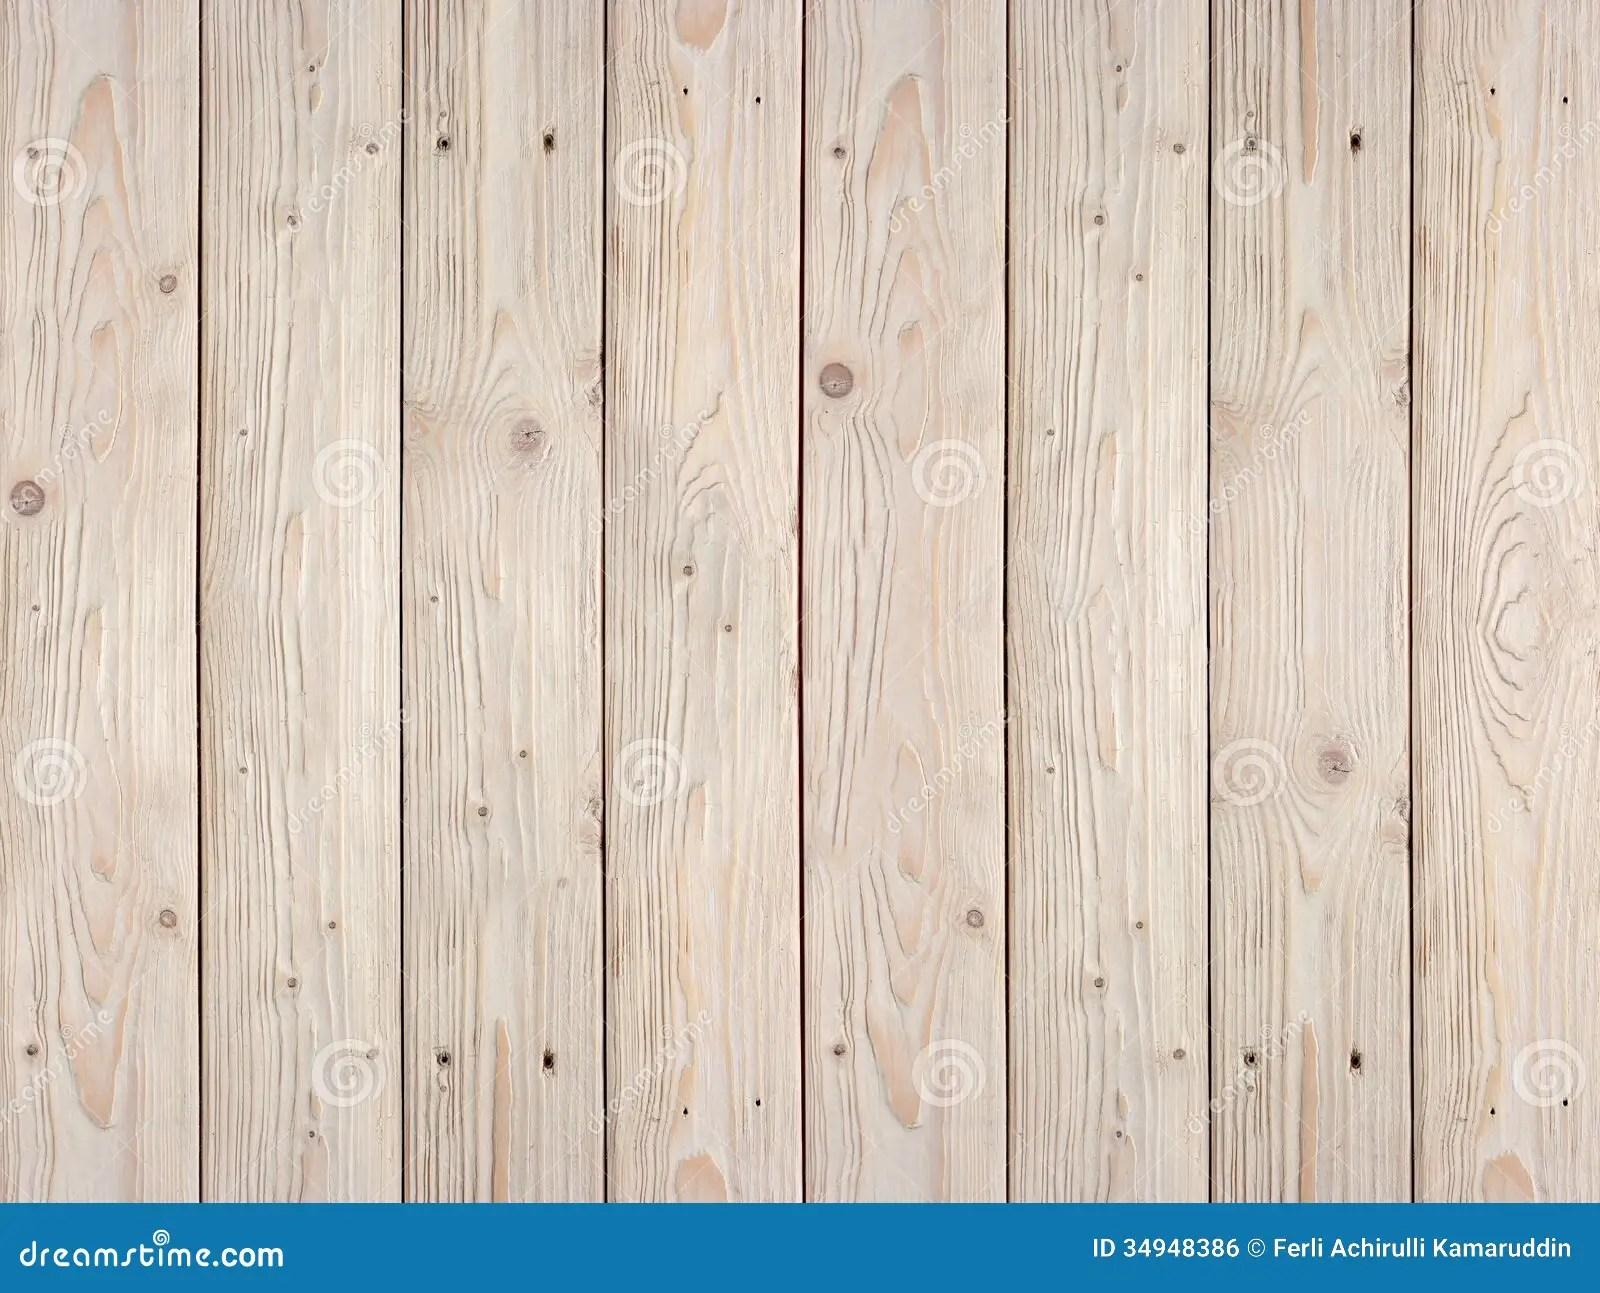 Wood plank background stock photo Image of parquet